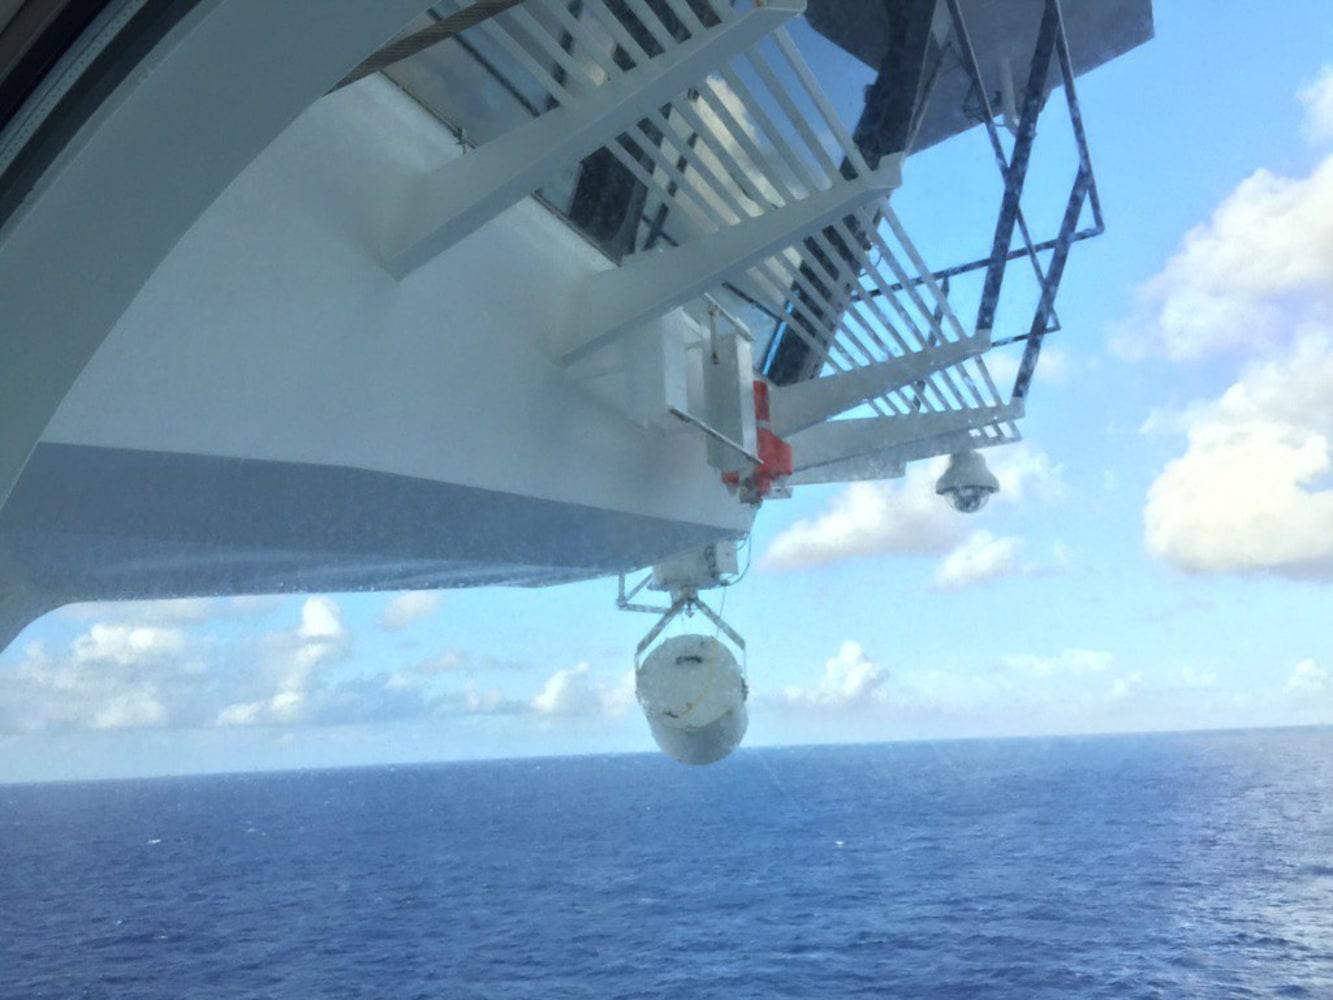 Royal Caribbean Cruise Jumper Detlandcom - Cruise ship jumper